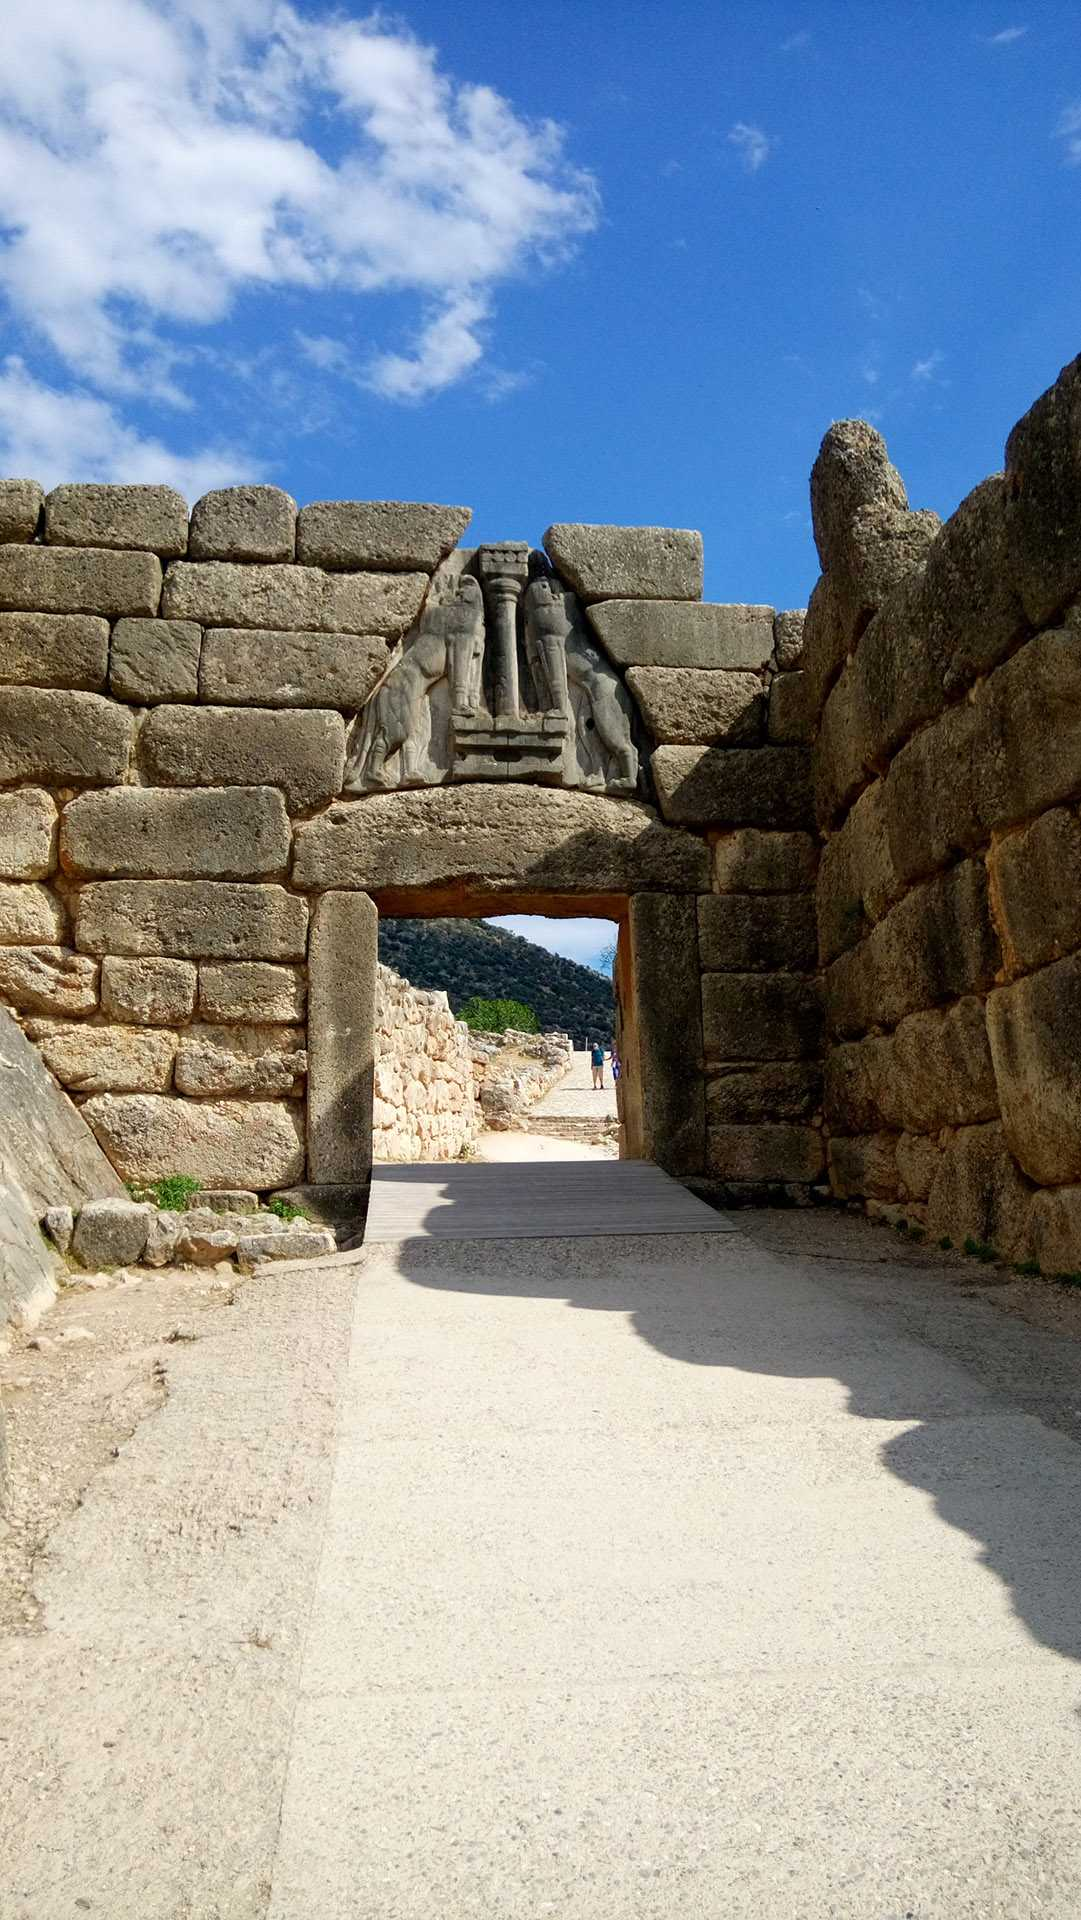 Tour para o canal de Corintho, Micenas e Epidavros